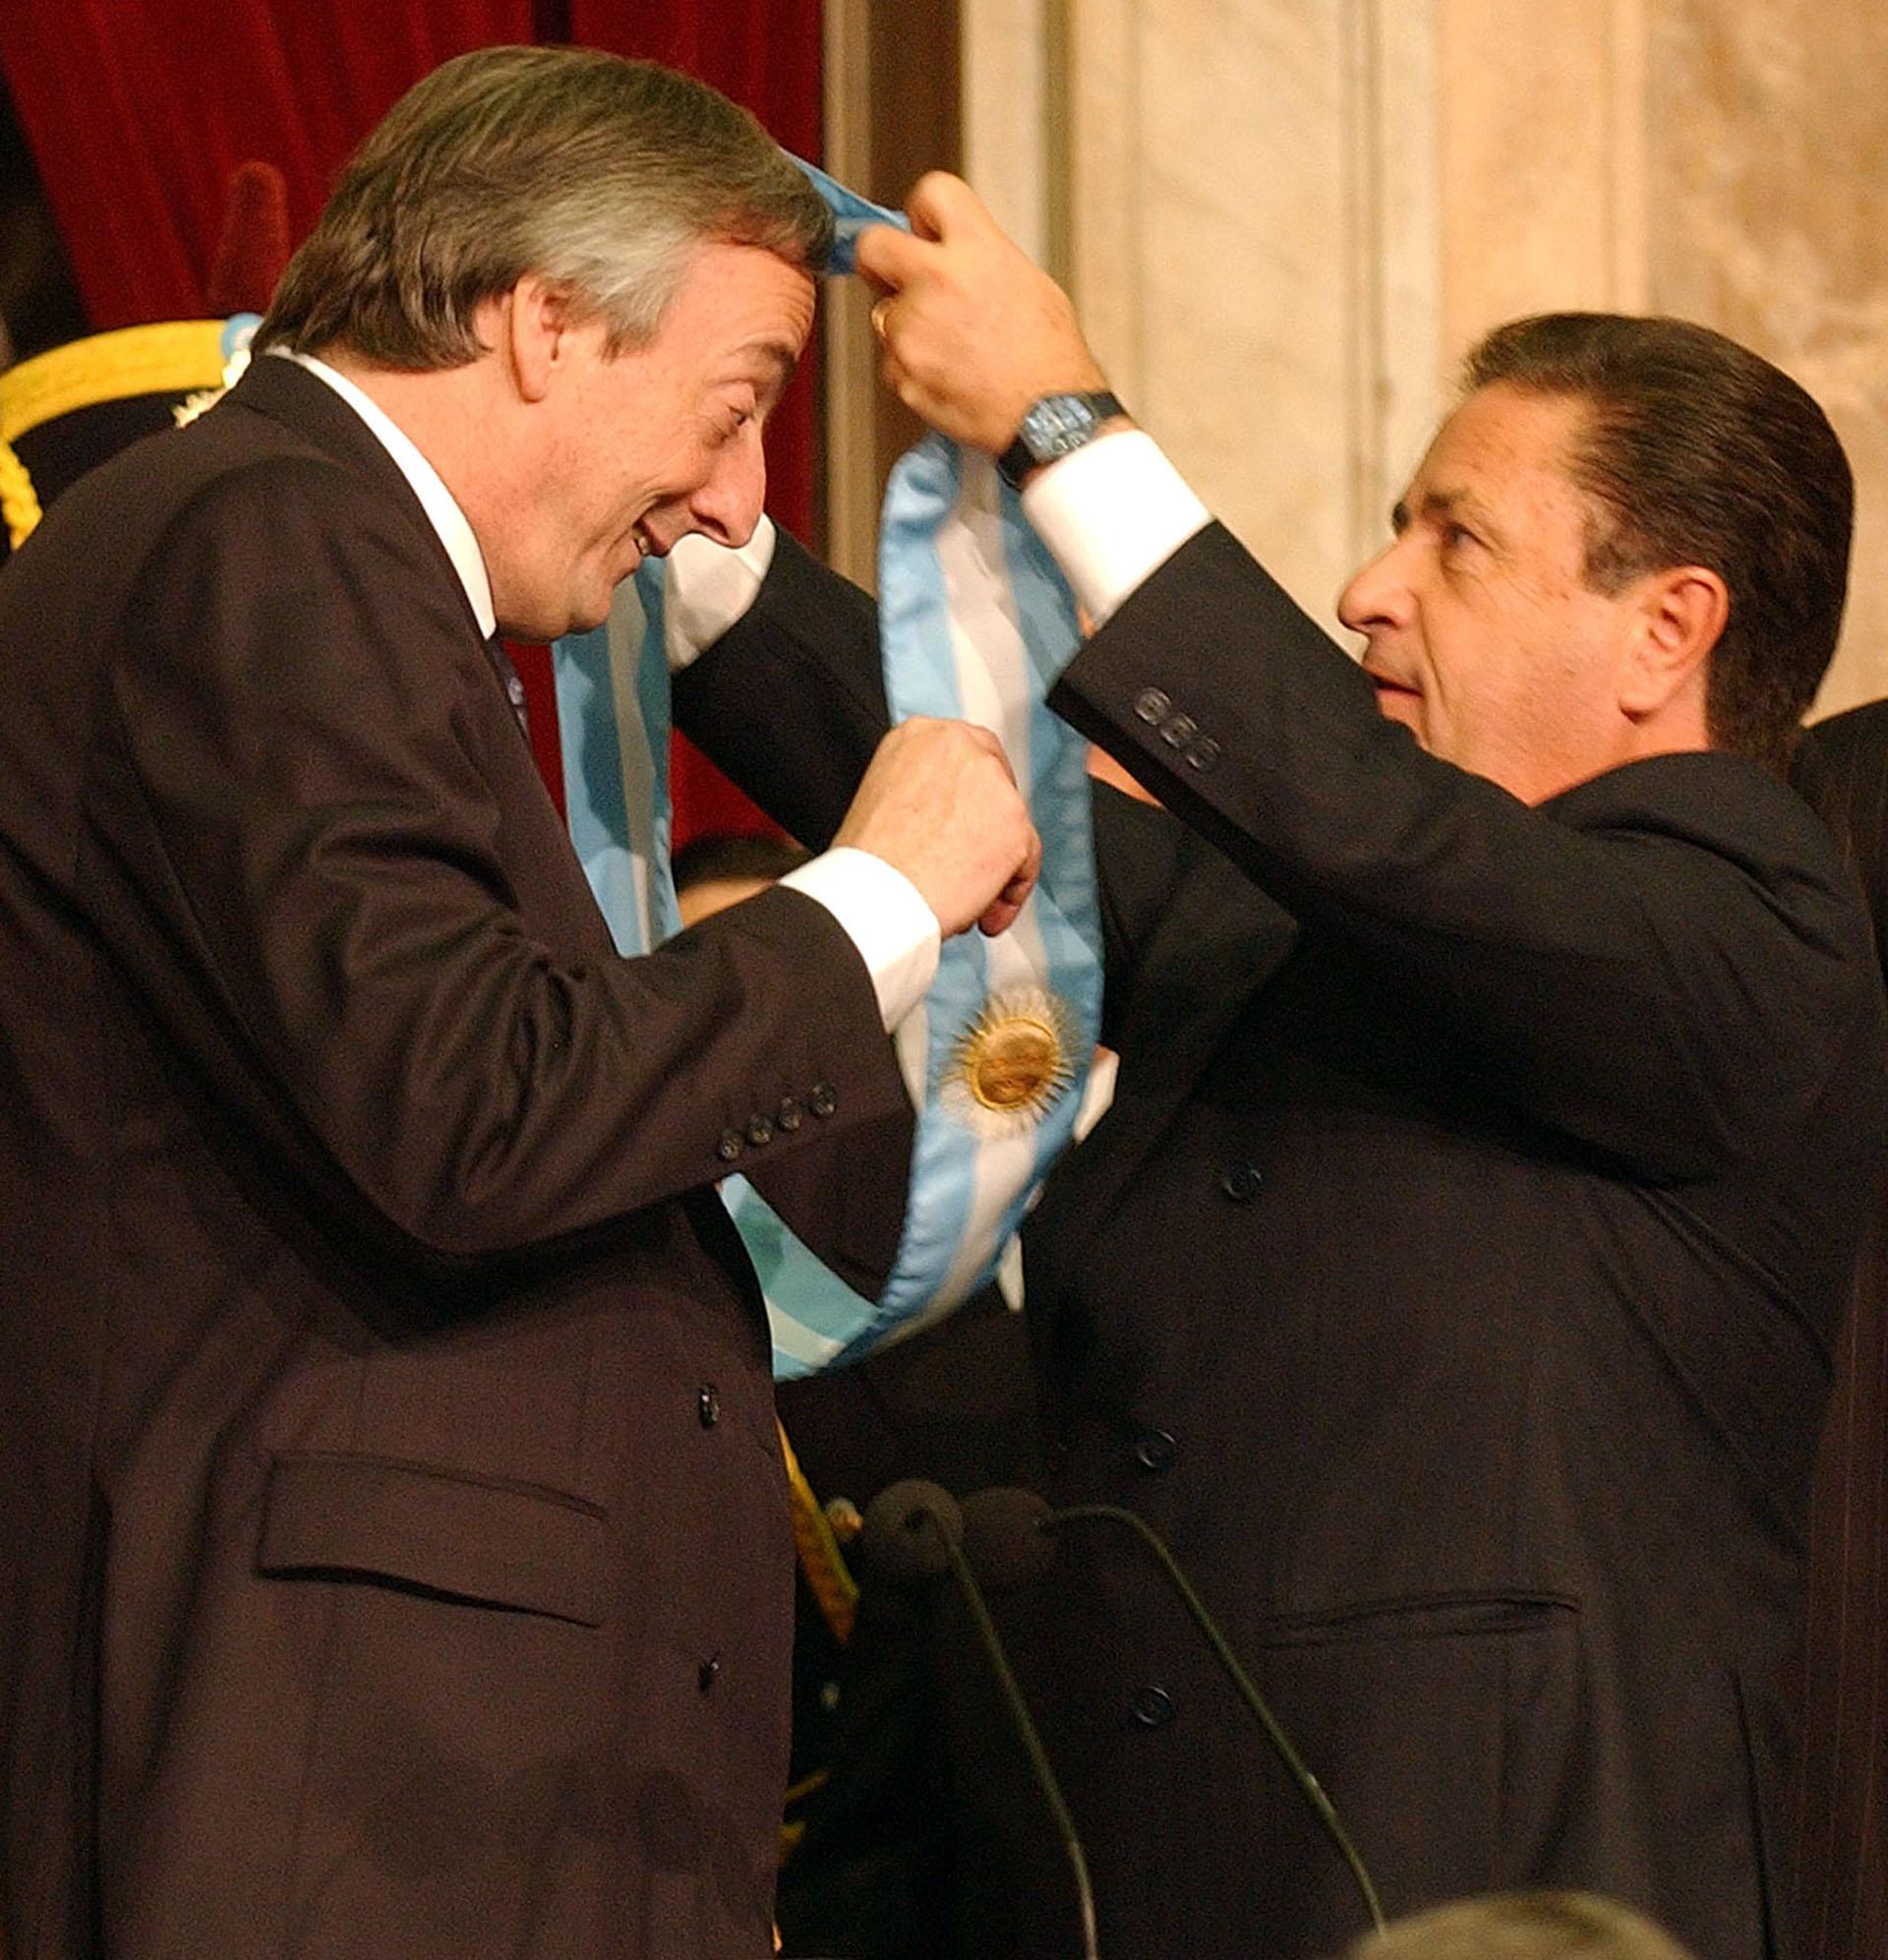 El presidente Néstor Kirchner recibe la banda presidencial de manos de Eduardo Duhalde frente a la asamblea legislativa